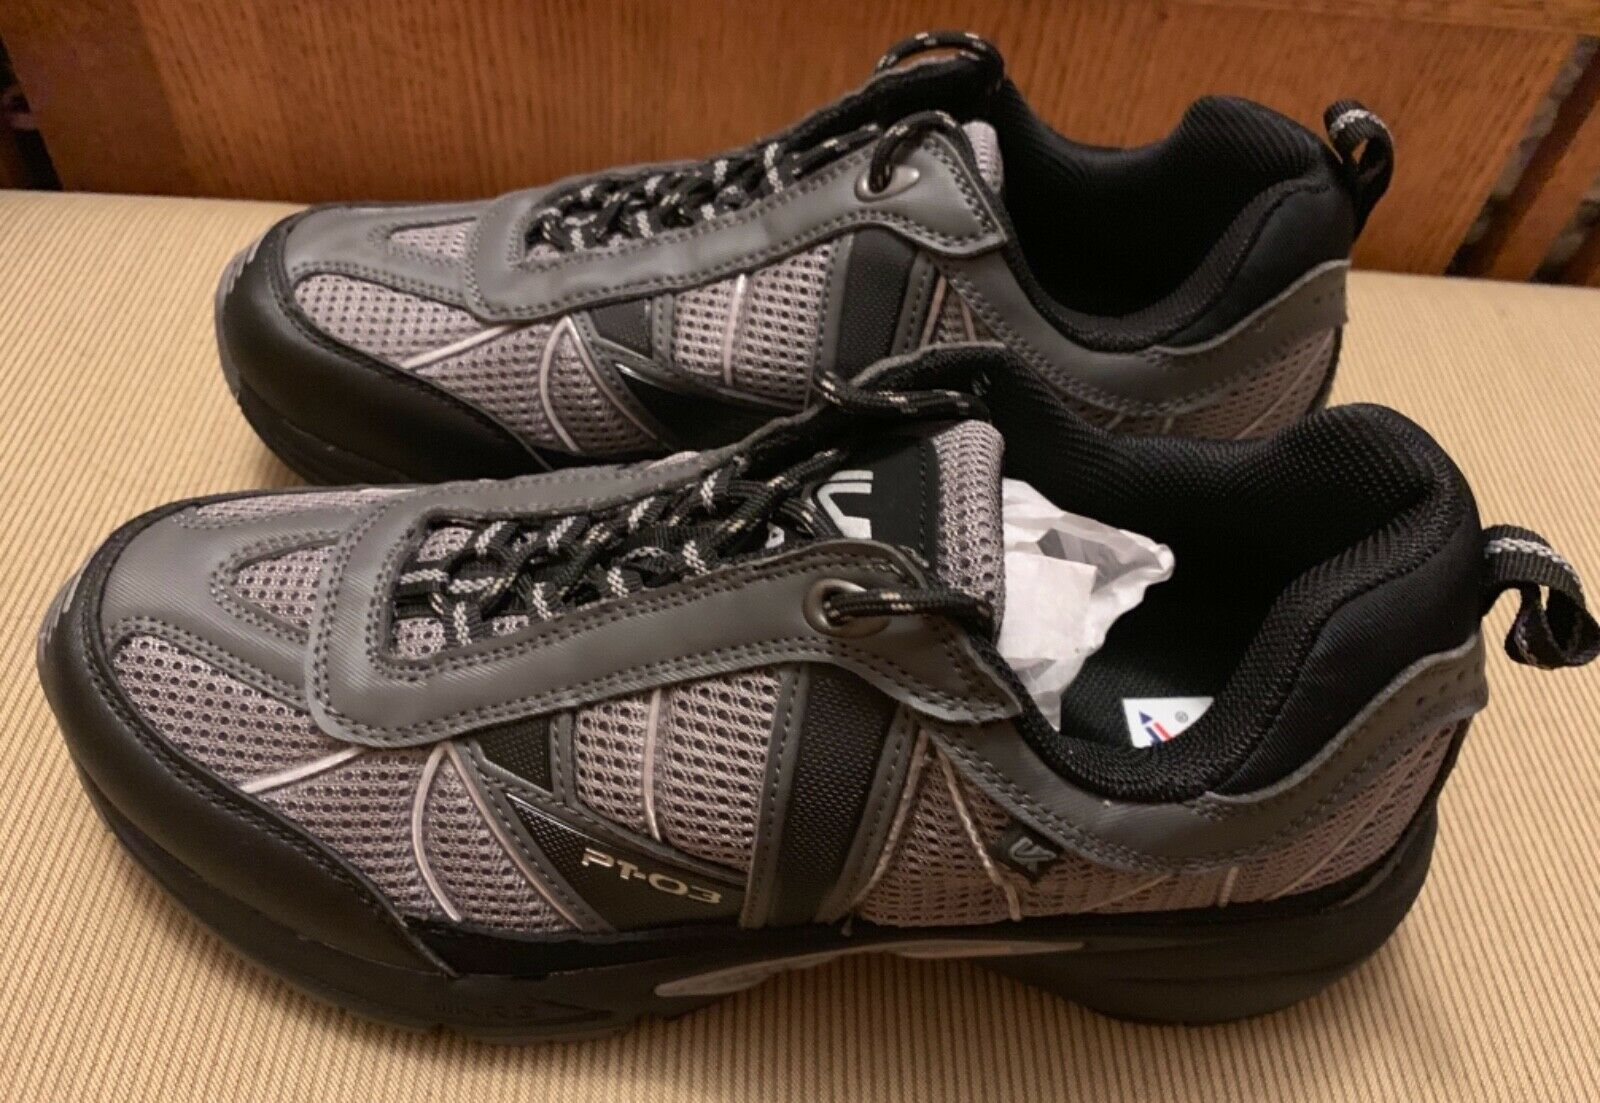 9.5 geométrico ASICS Hombre Talla de calzado de Hombres EE